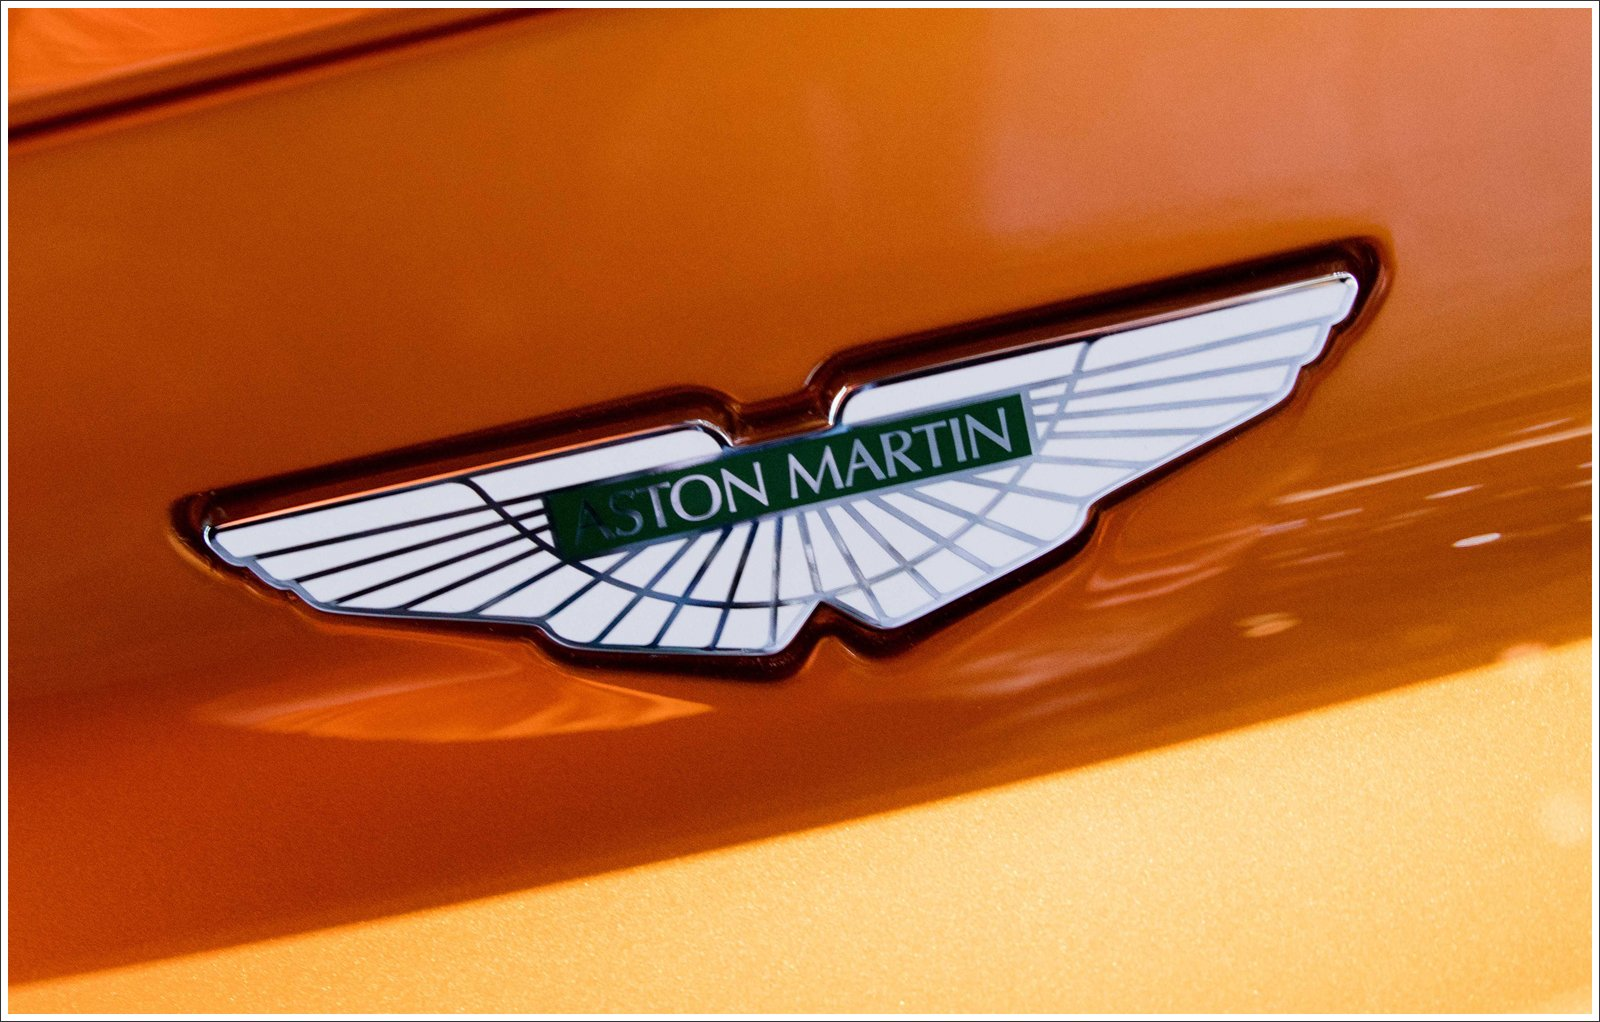 Aston Martin Logo Meaning And History Symbol Aston Martin World - Aston martin logo